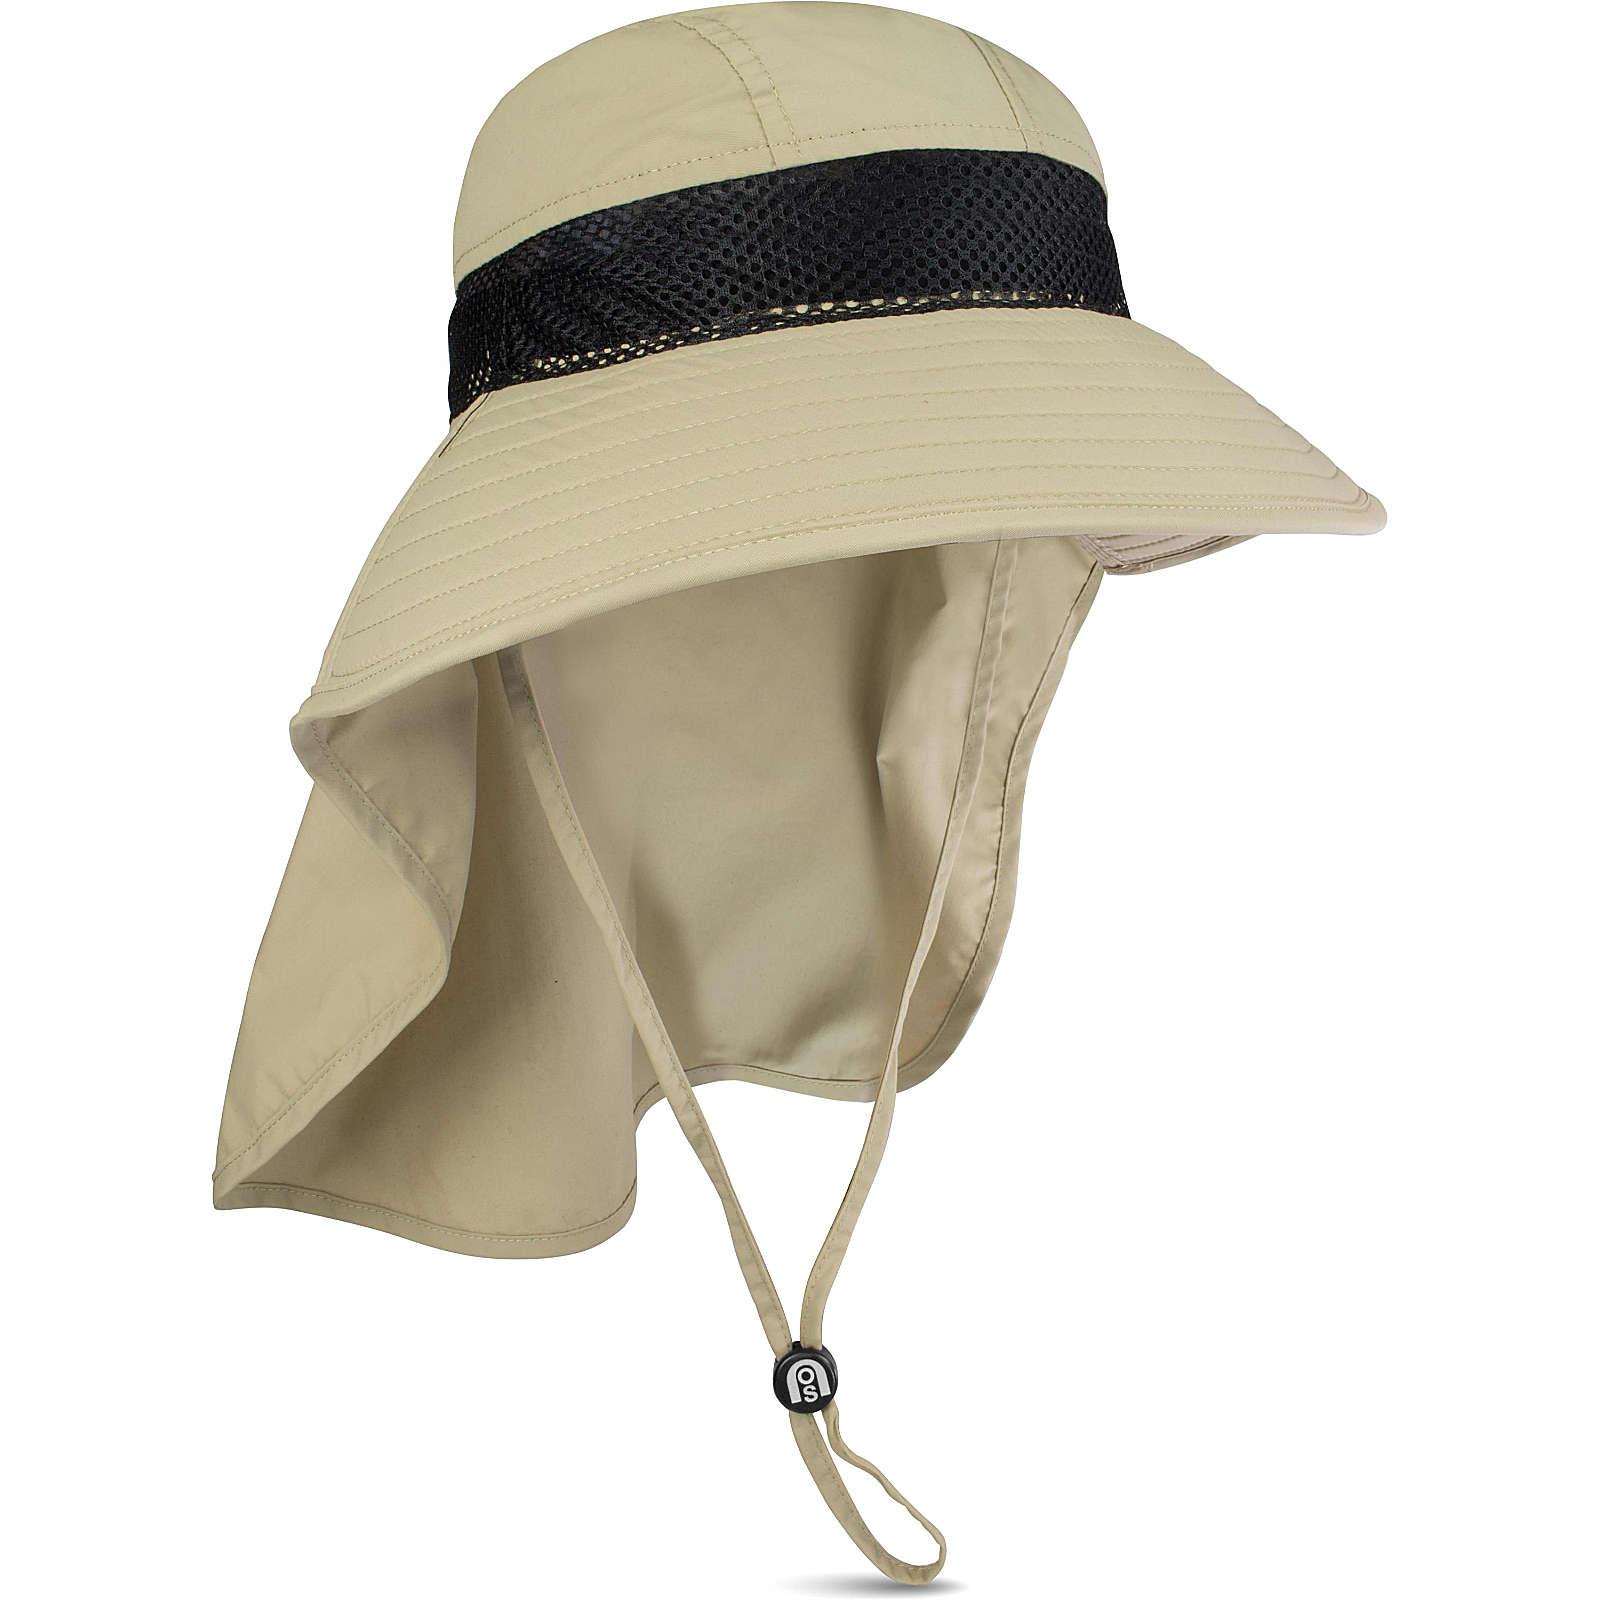 normani® Sommerhut Boyerich Regenhüte khaki Gr. 58-61